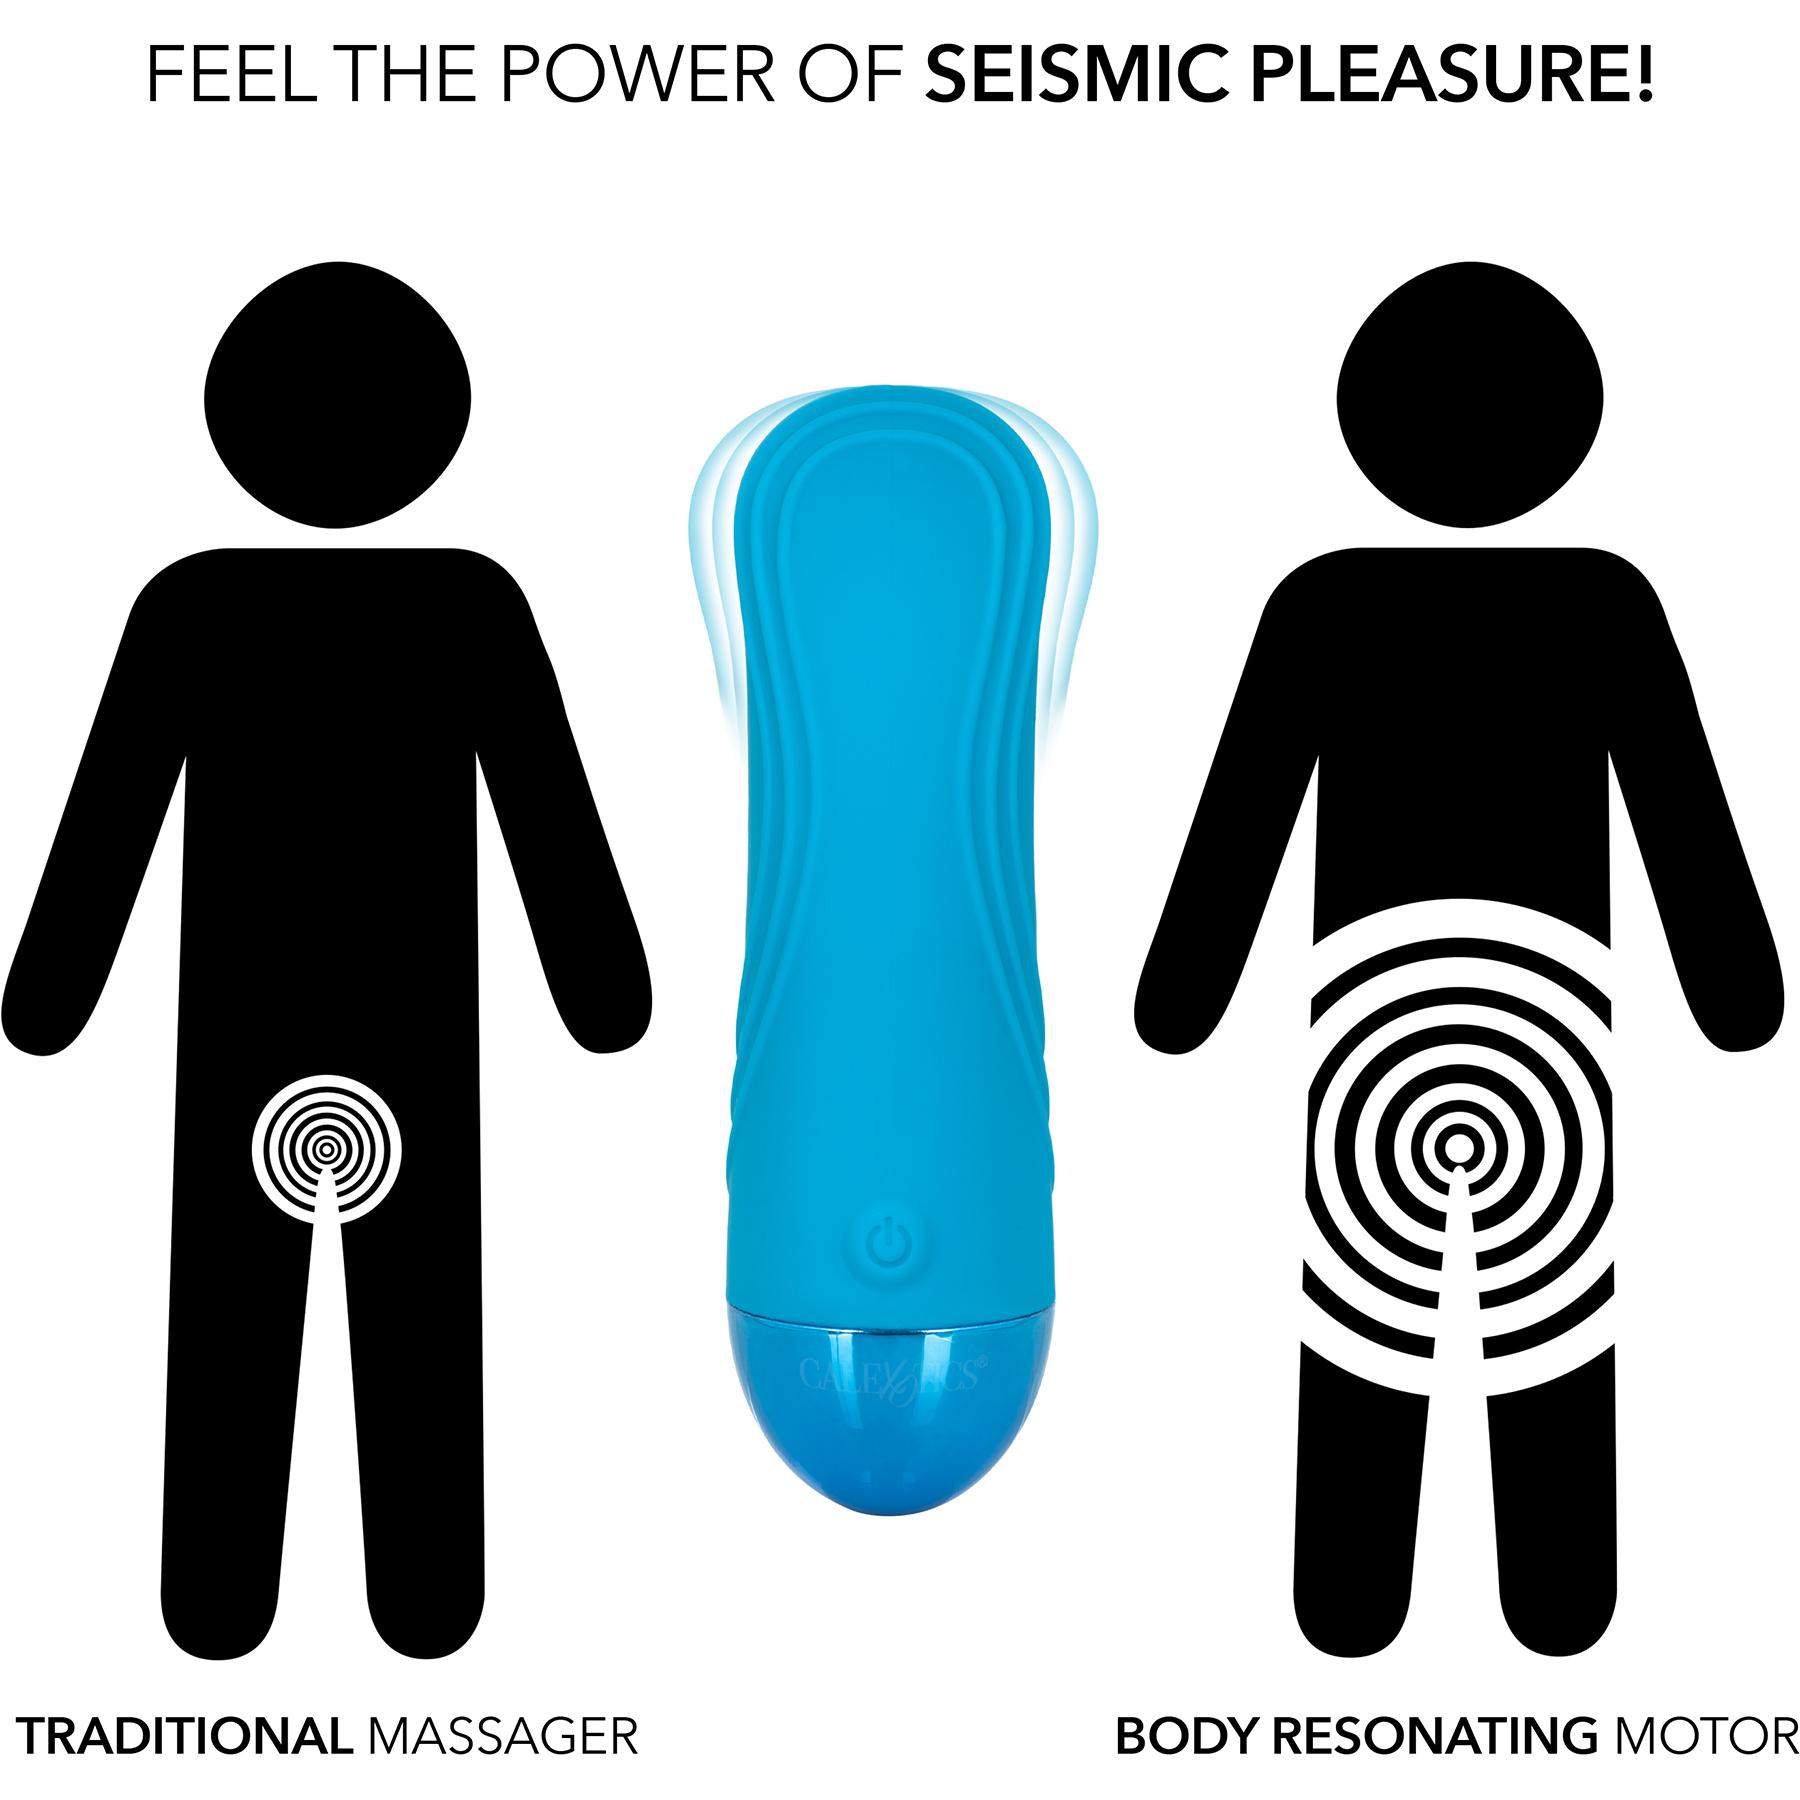 Tremble Tickler Waterproof Rechargeable Silicone Seismic Vibrator - Comparison